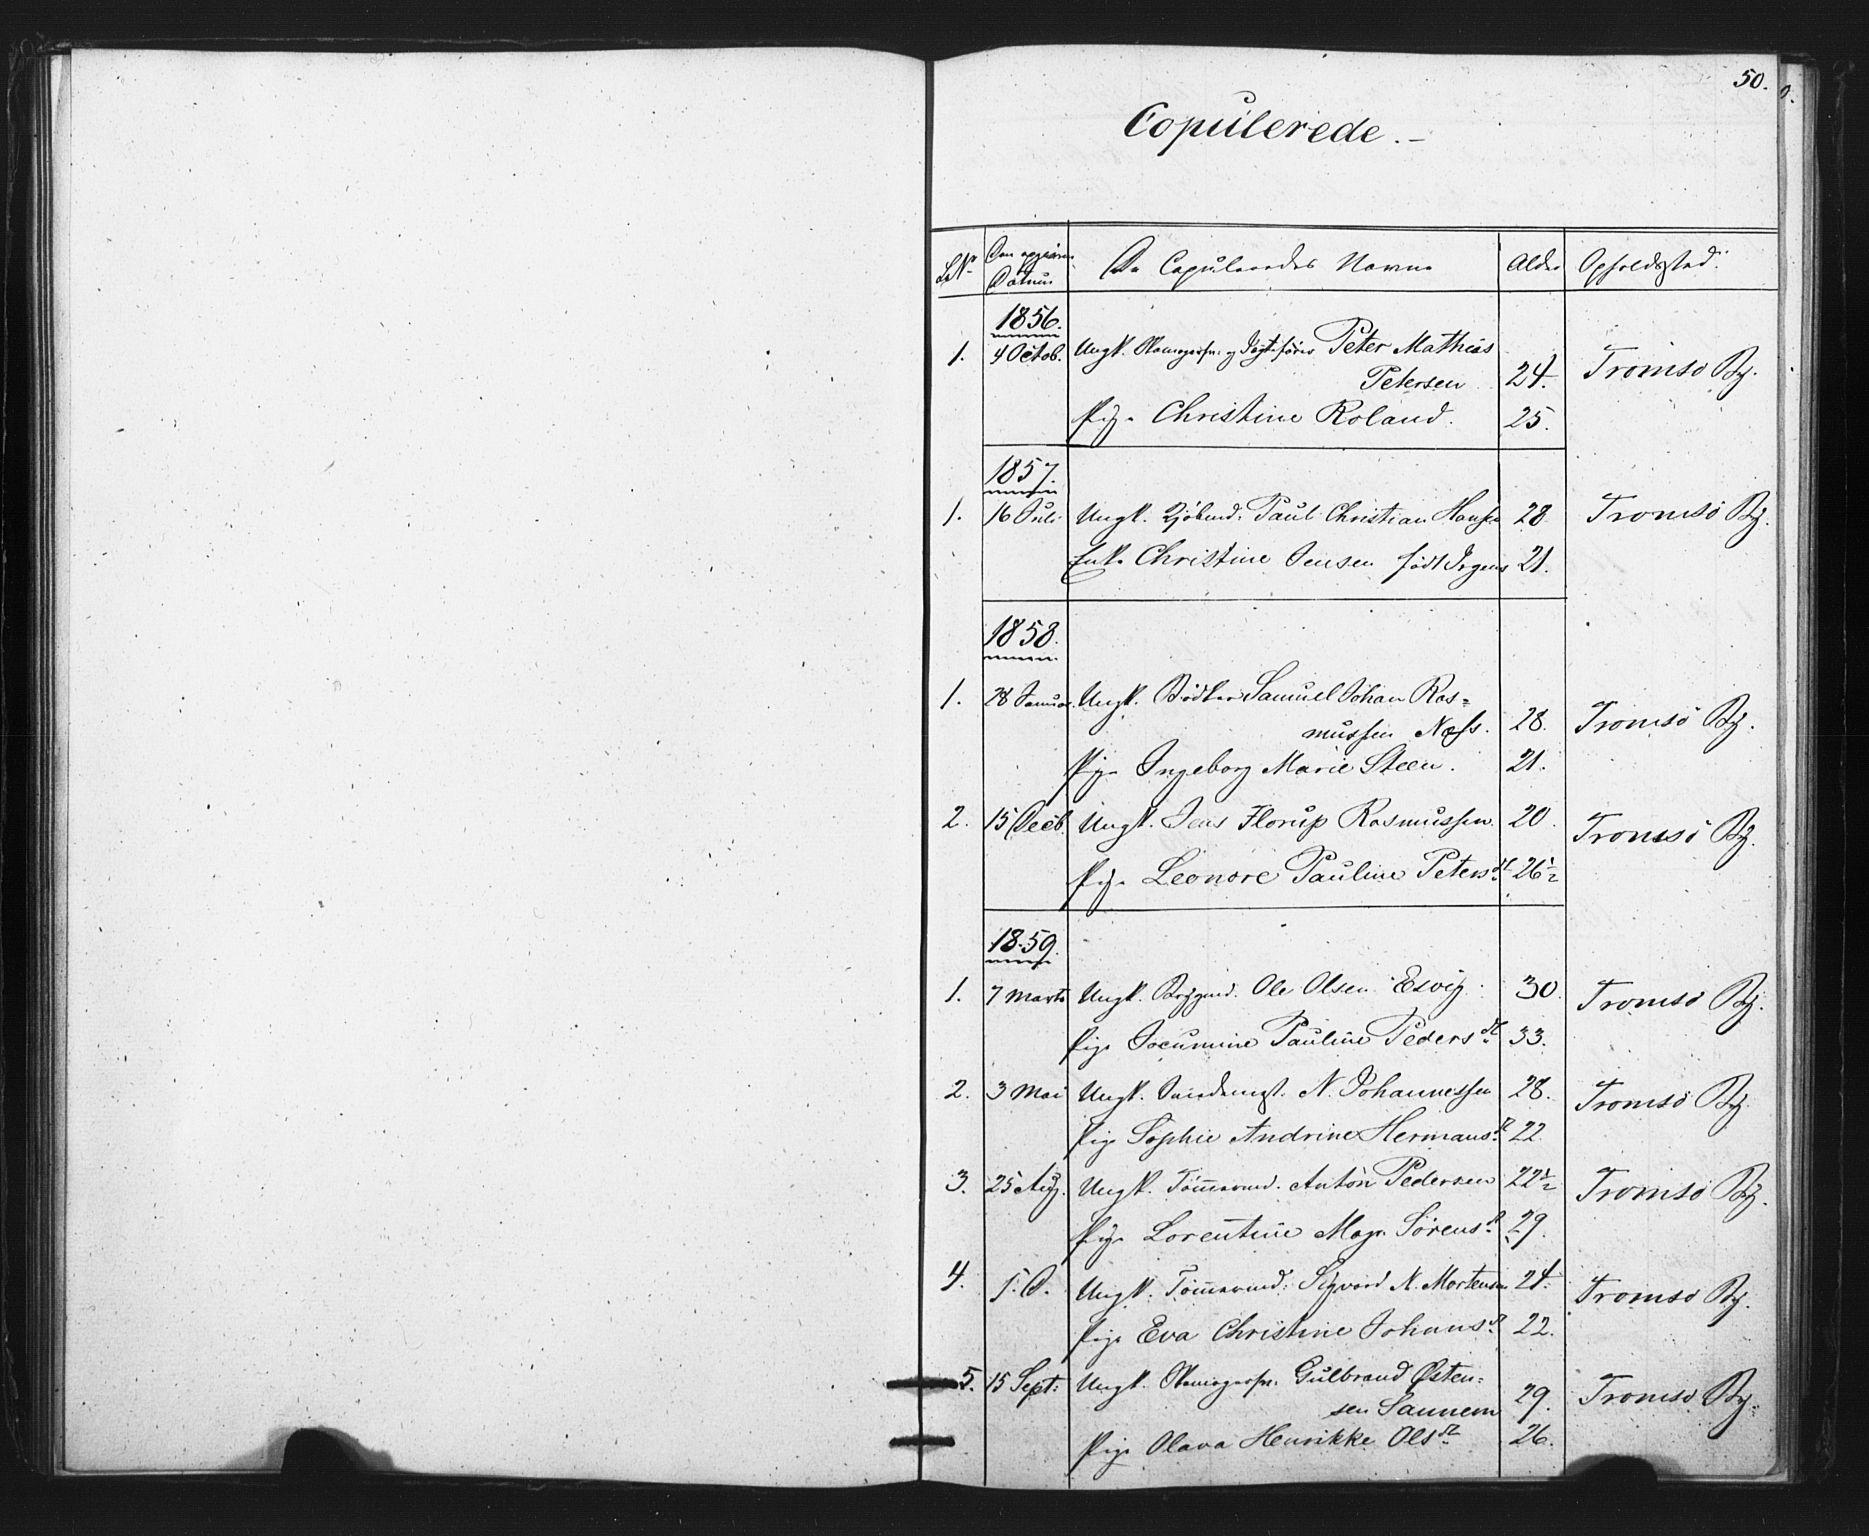 SATØ, Tromsø sokneprestkontor/stiftsprosti/domprosti, G/Ge/L0067: Dissenterprotokoll nr. 67, 1856-1882, s. 50